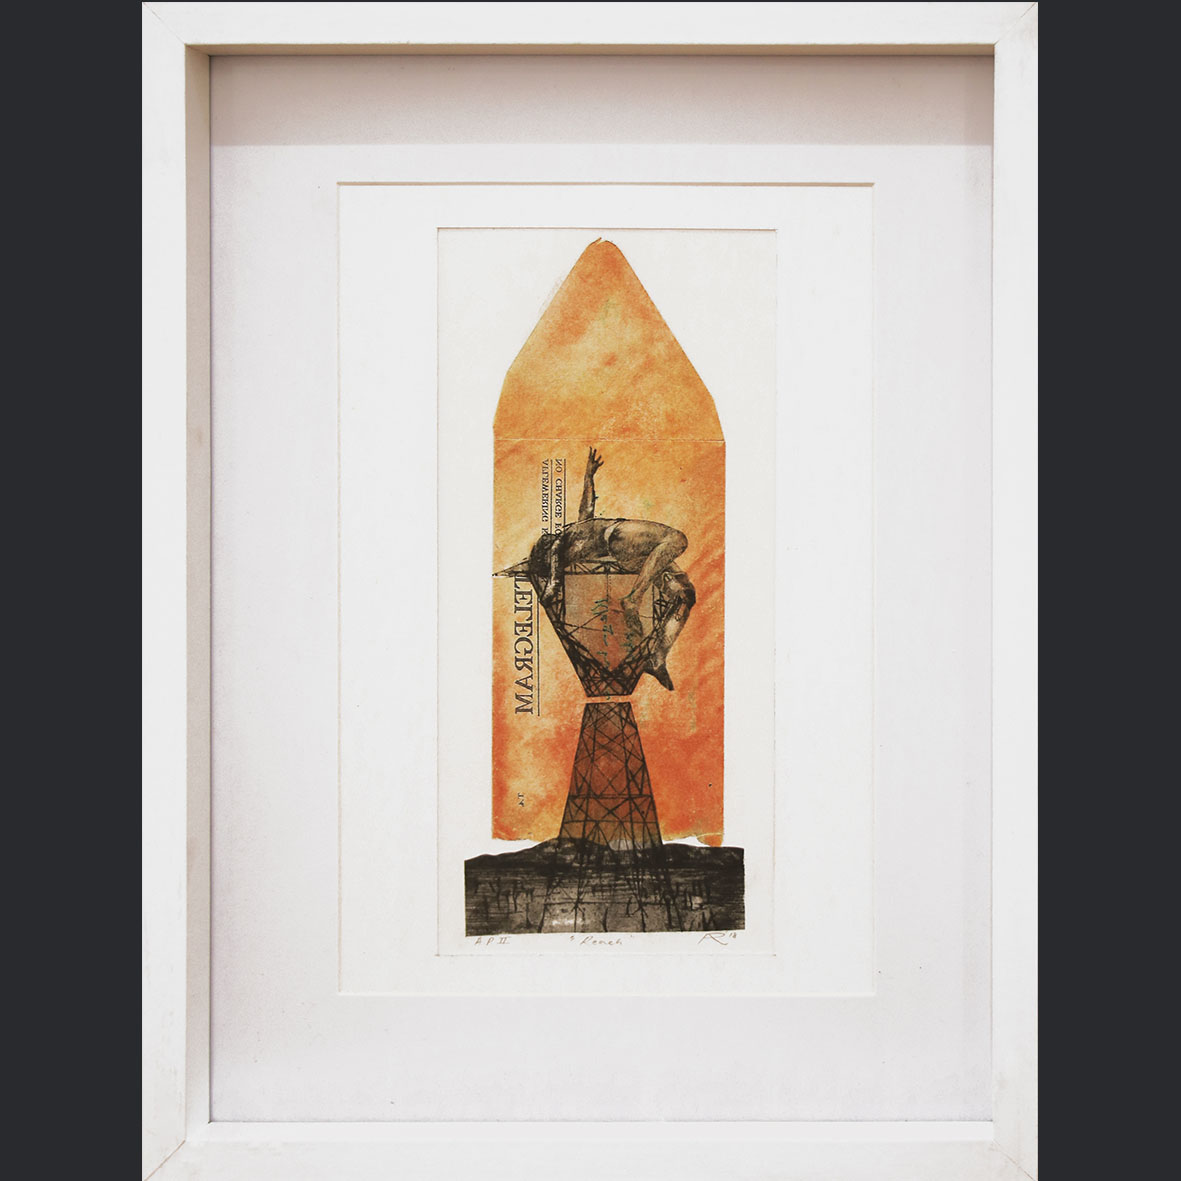 Adrian Ranger, Reach - APII, 2018, Hybrid Print, 32.5 x 42.5 cm